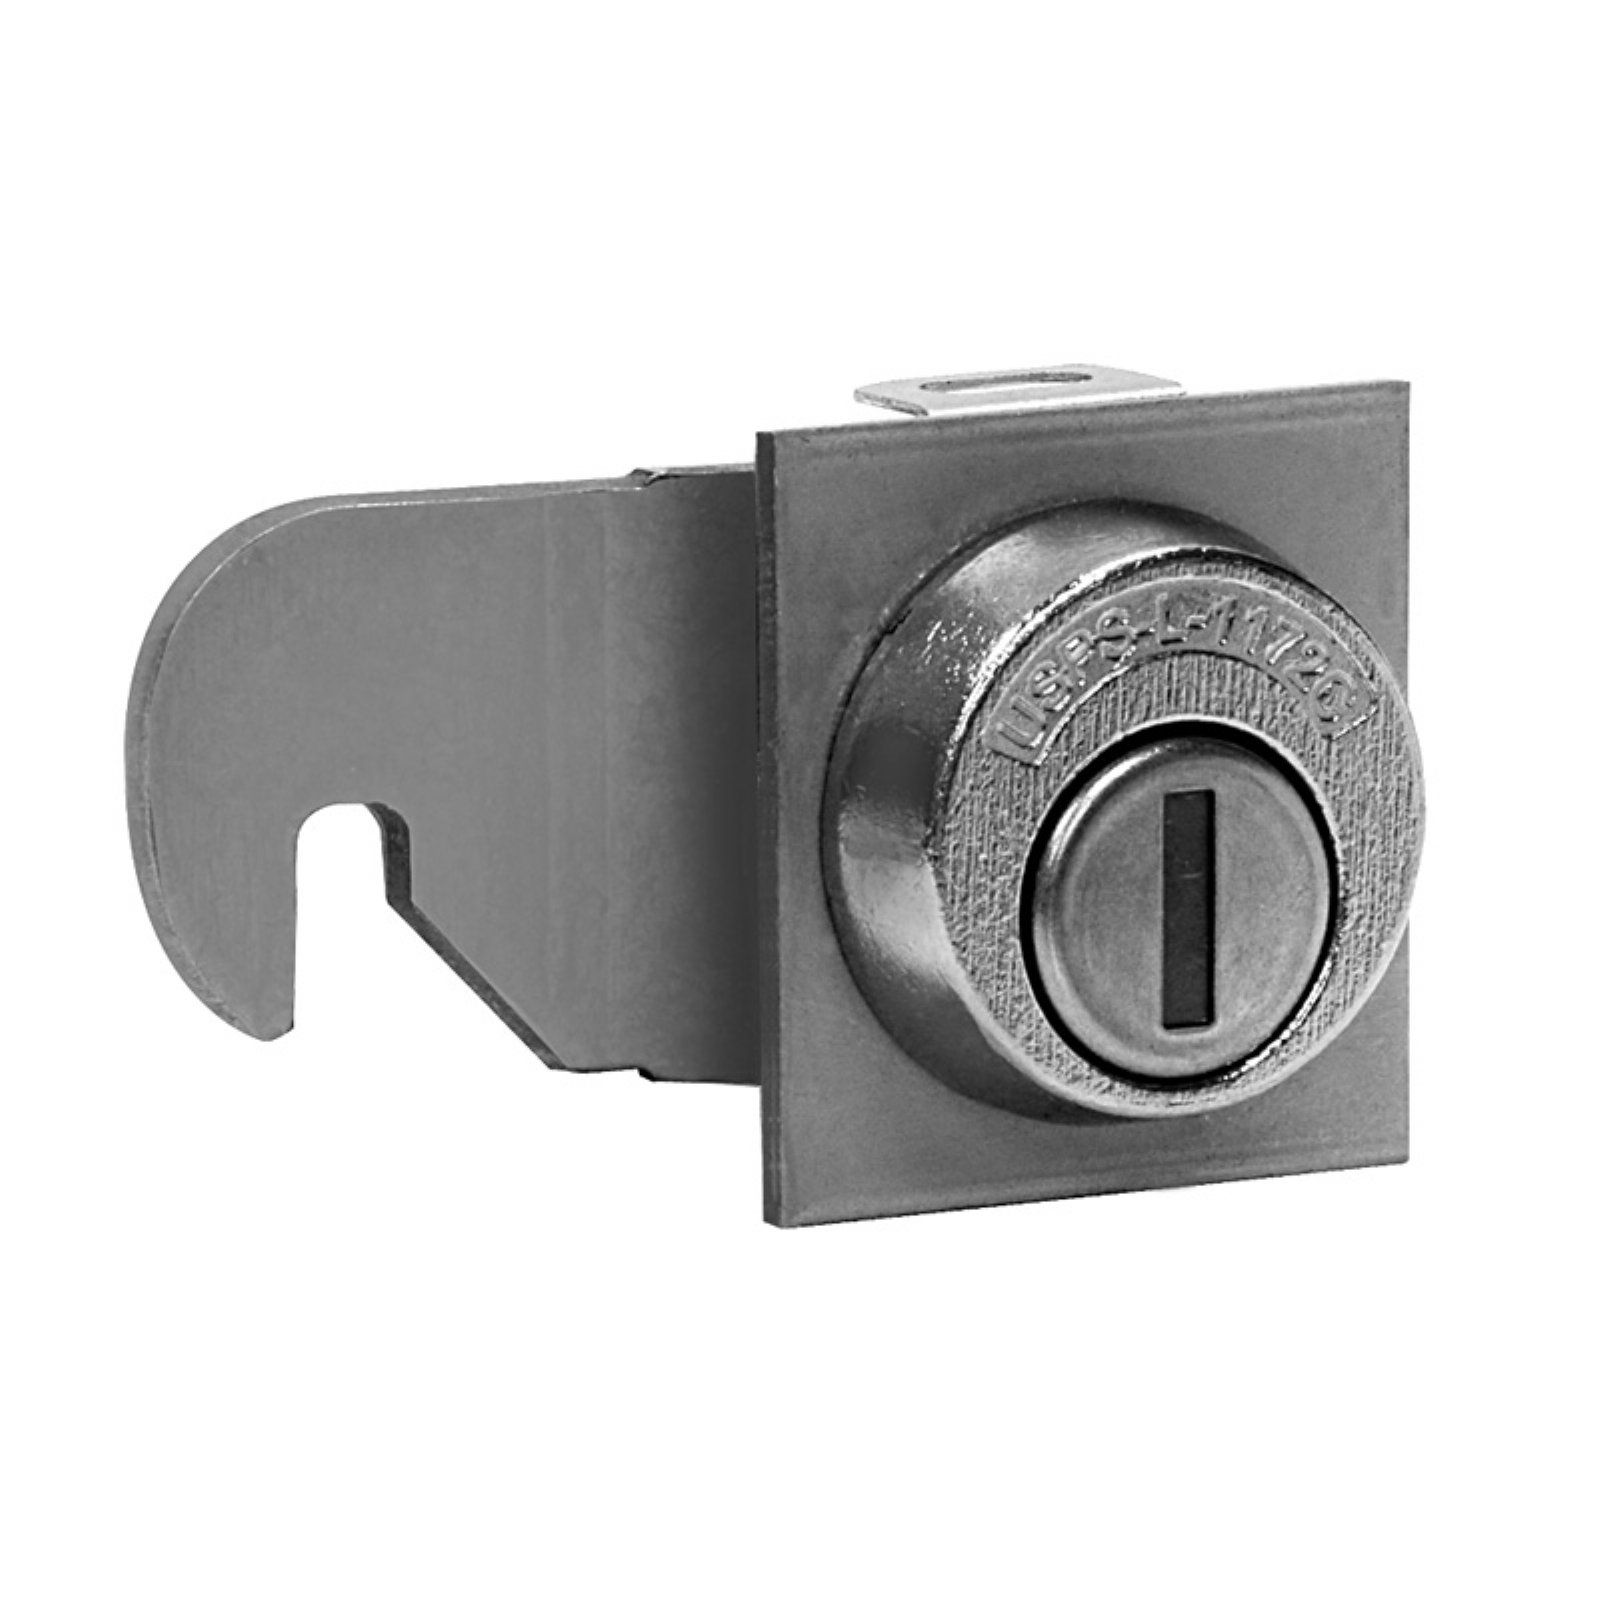 6 Cast Aluminum Brick Mailbox Replacement Door By Better Box